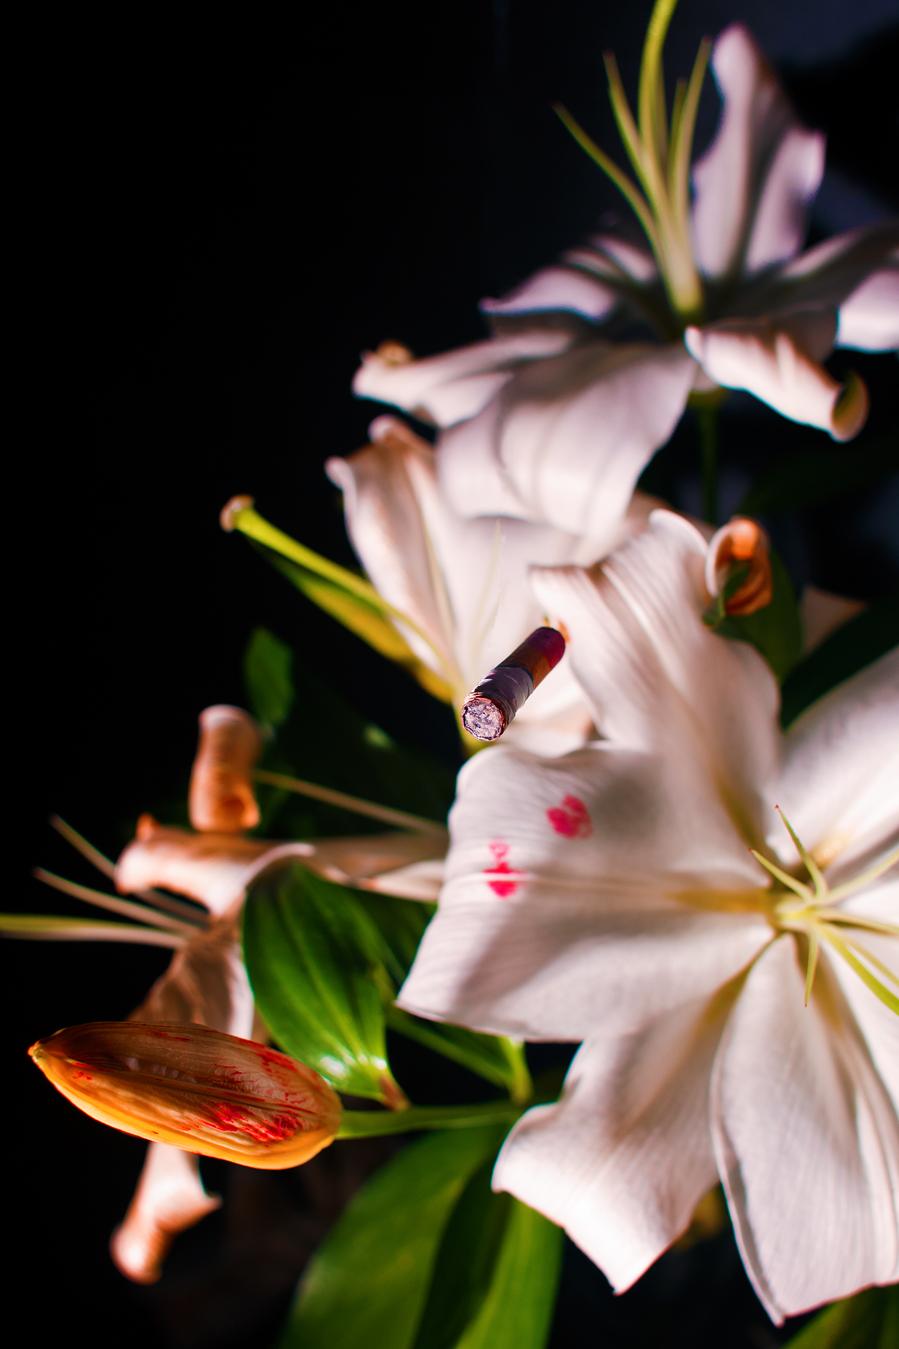 lipstick-cigarette-flower-by-ransom-ashley-(1).jpg